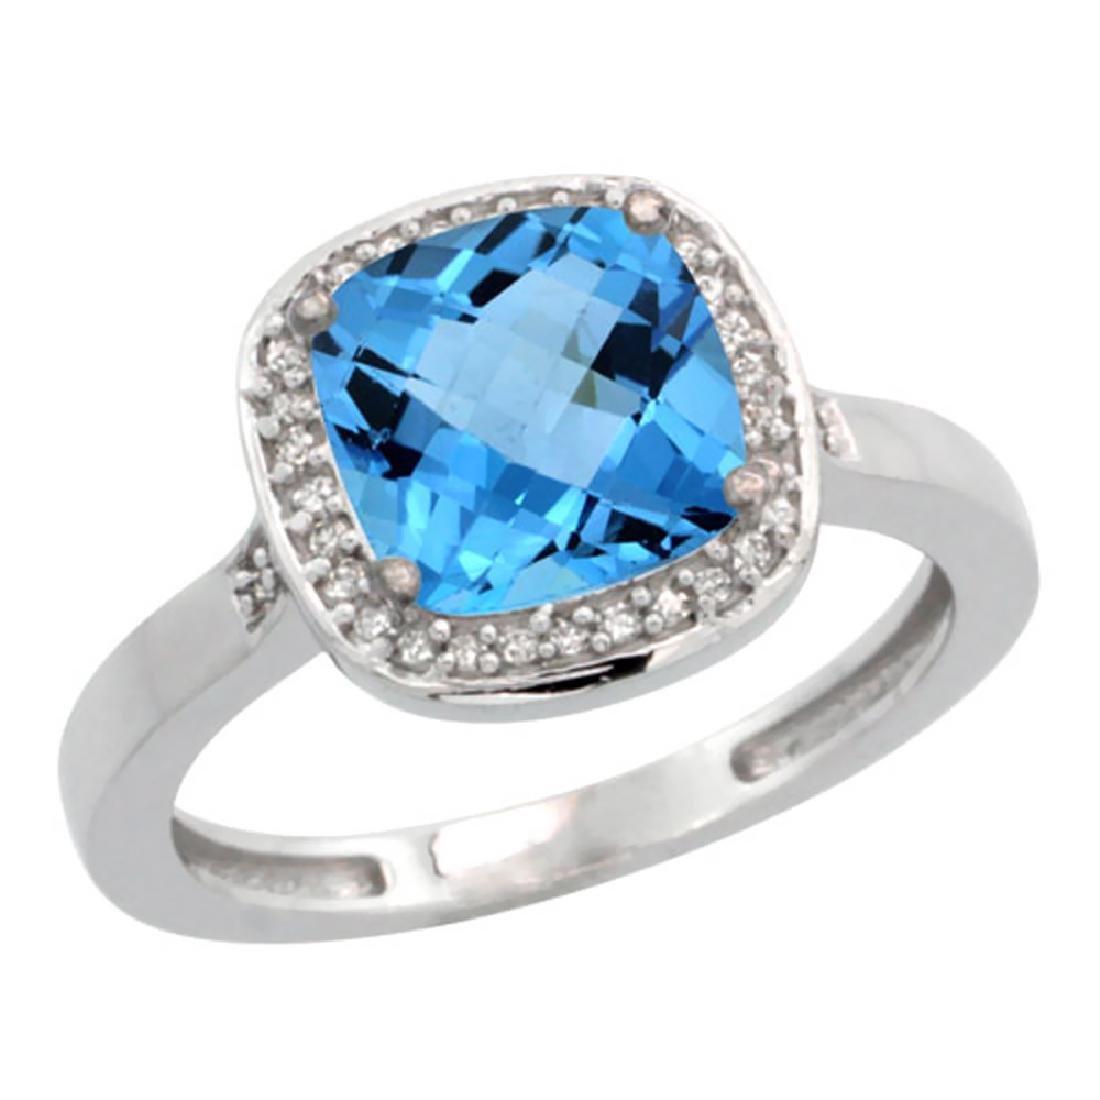 Natural 3.94 ctw Swiss-blue-topaz & Diamond Engagement